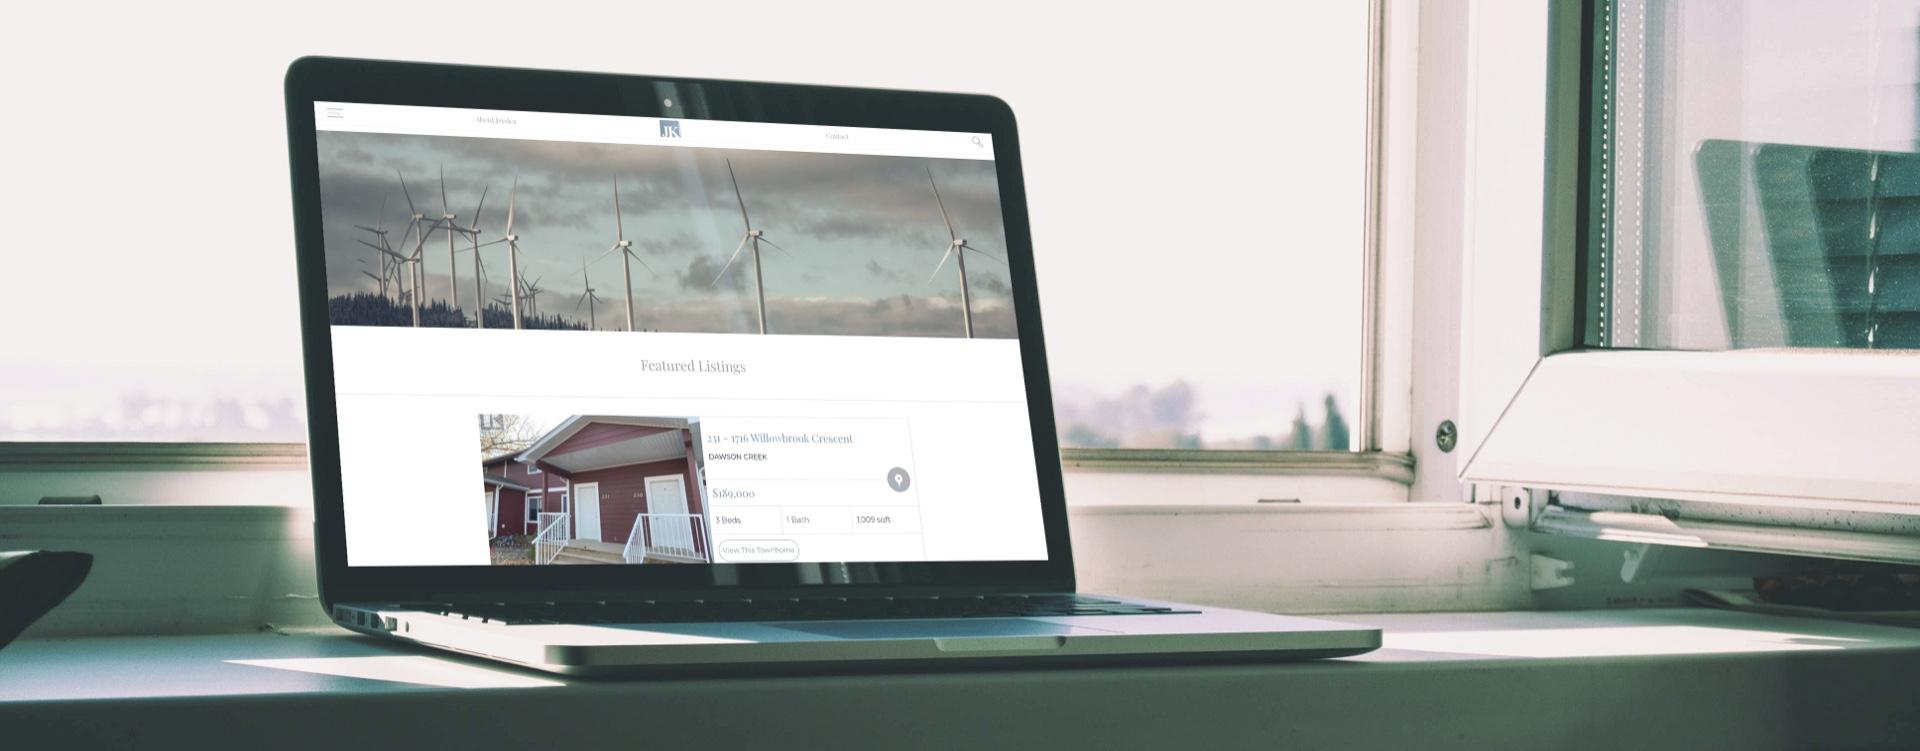 Personalized Realtor® website design with Dawson Creek MLS® listings